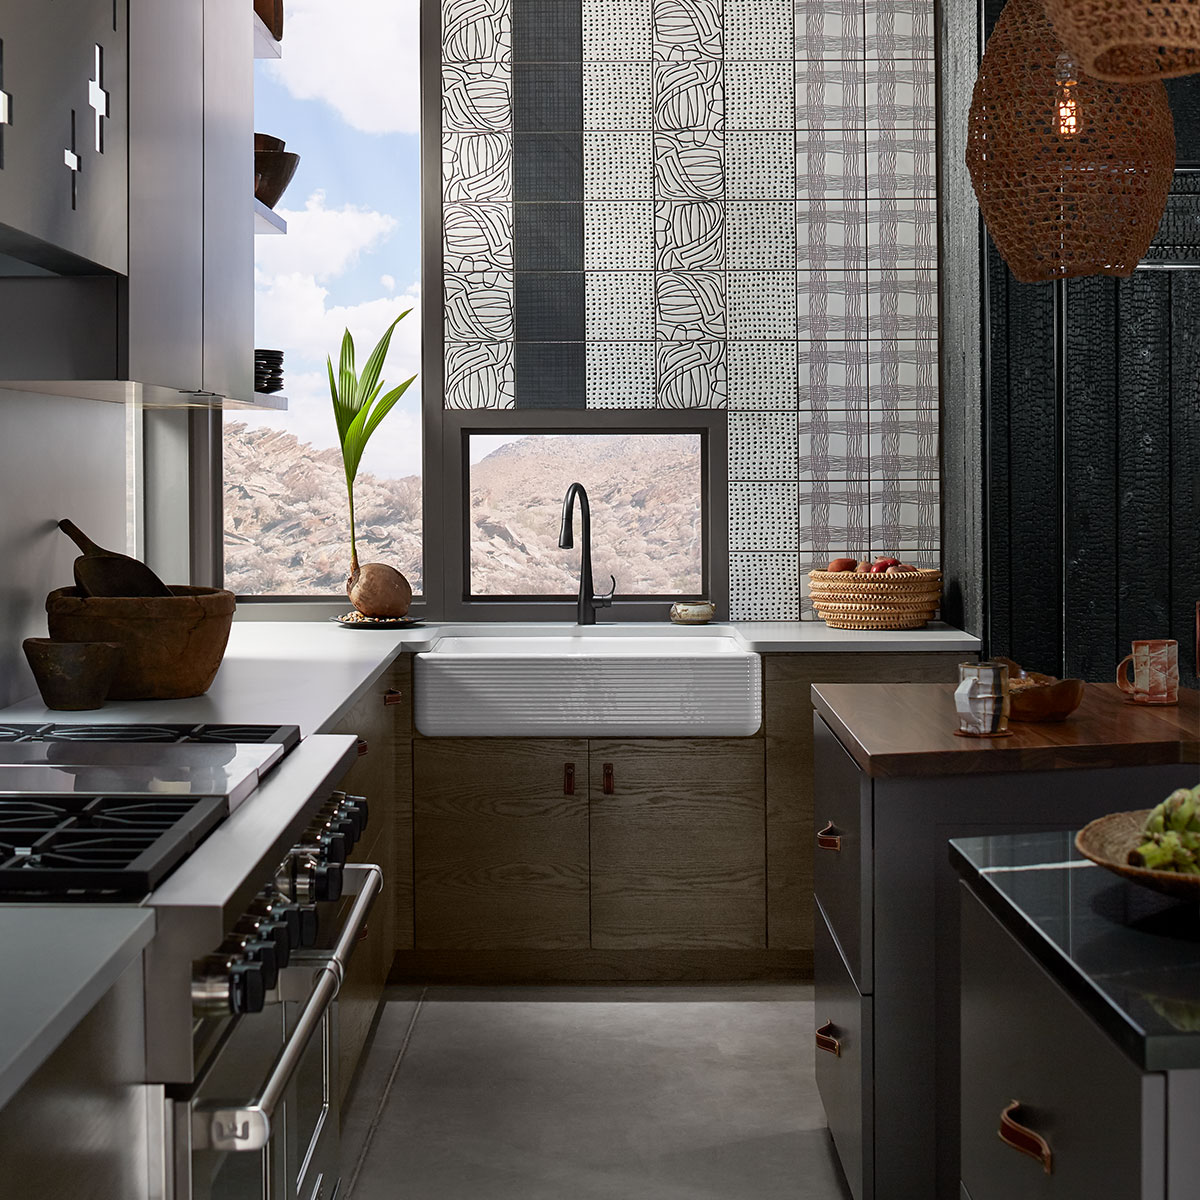 True Food Kitchen Design: HUMANature